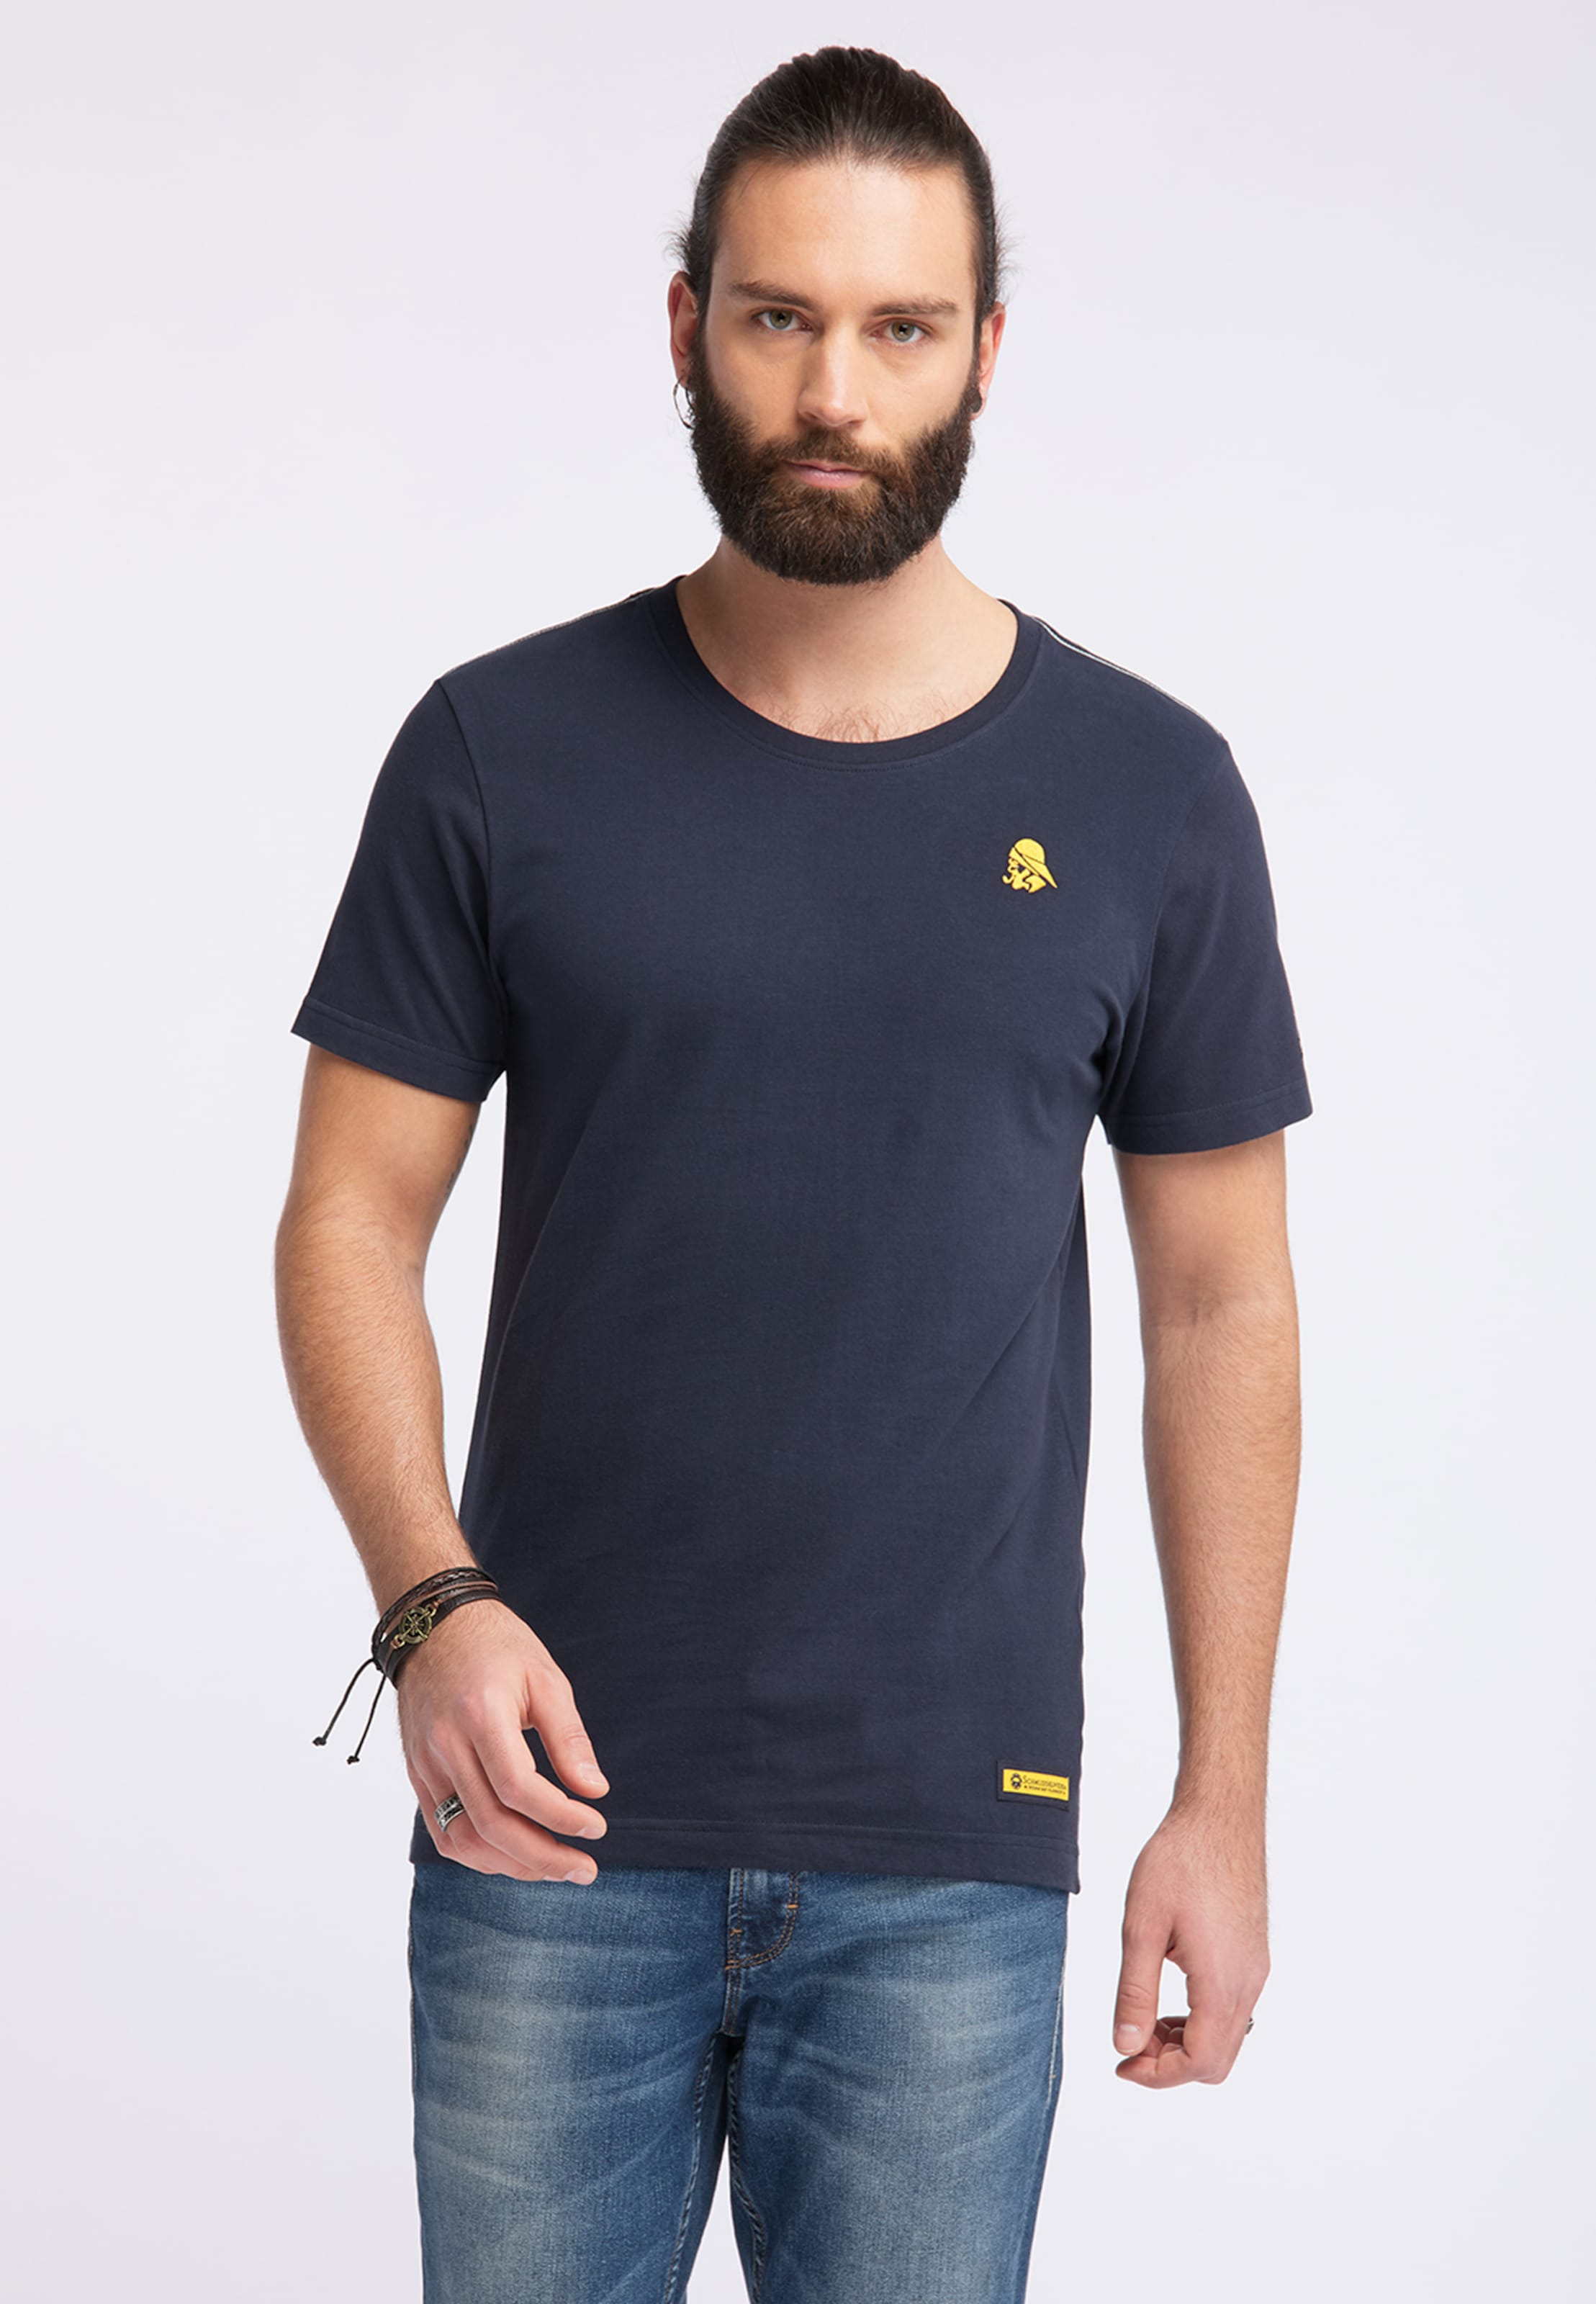 En Bleu Schmuddelwedda T Outremer shirt N8Xkw0nOP